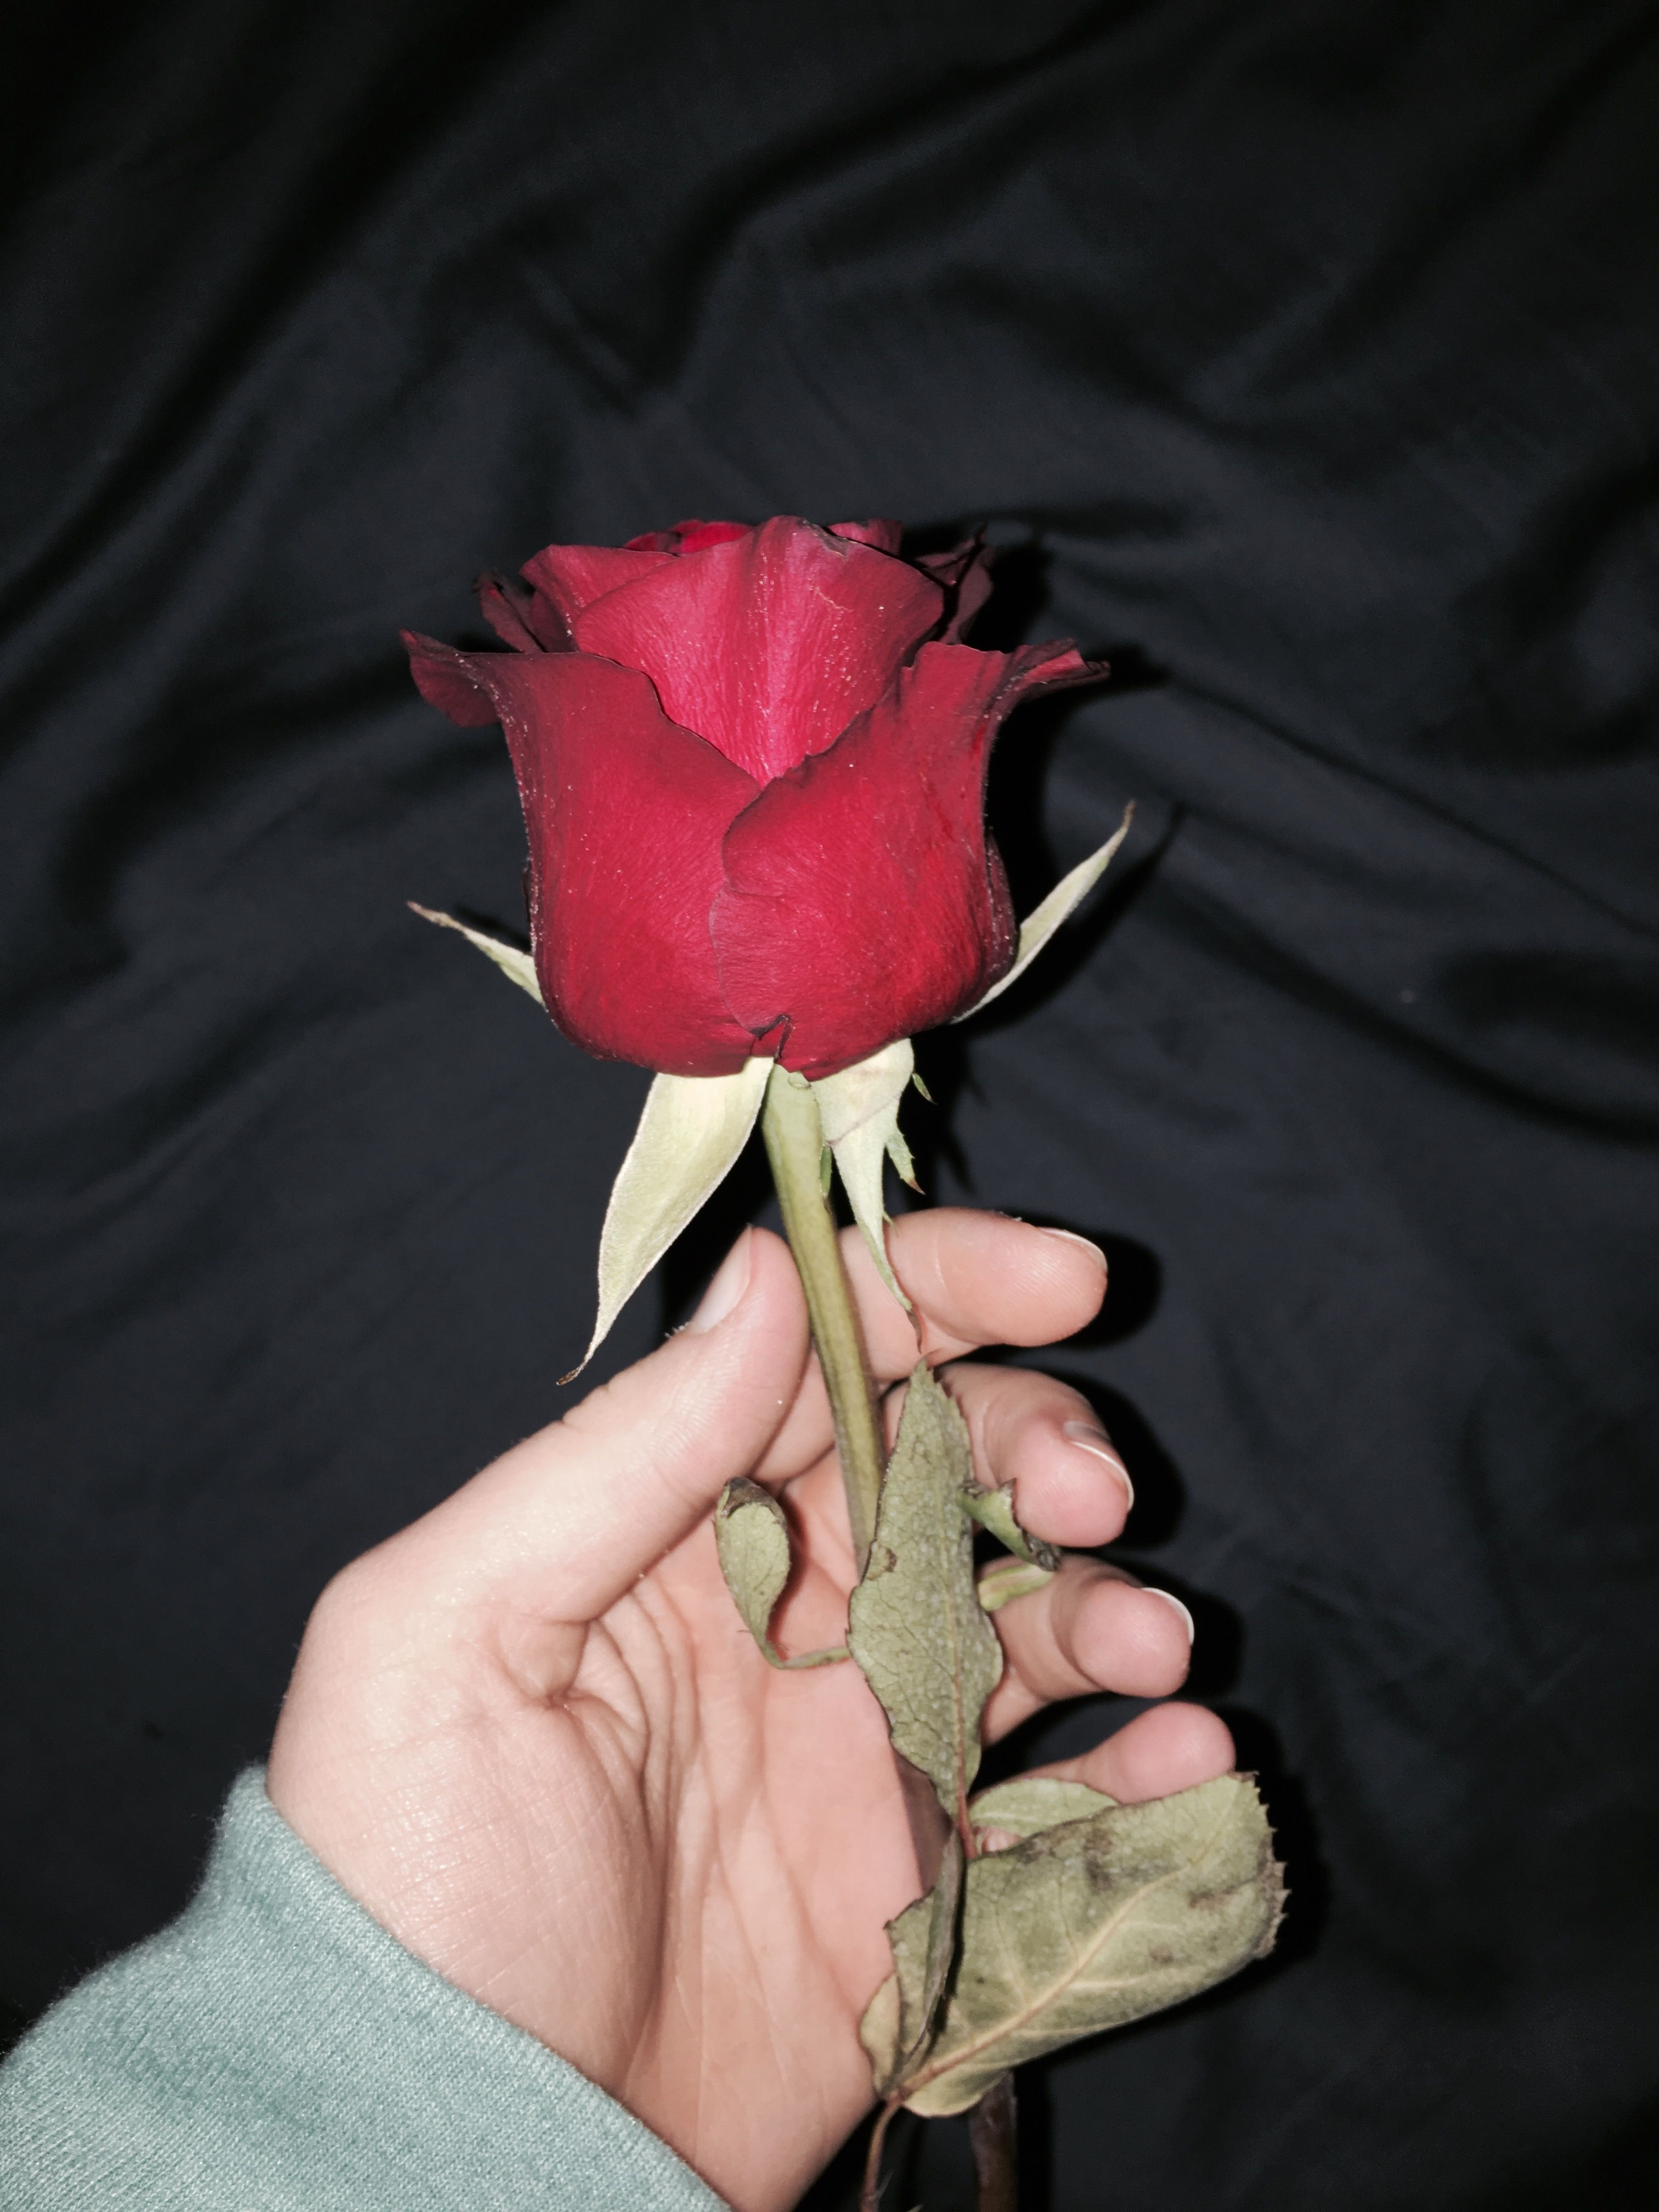 Rose Red Dark Grunge Aesthetic Photography Tumblr